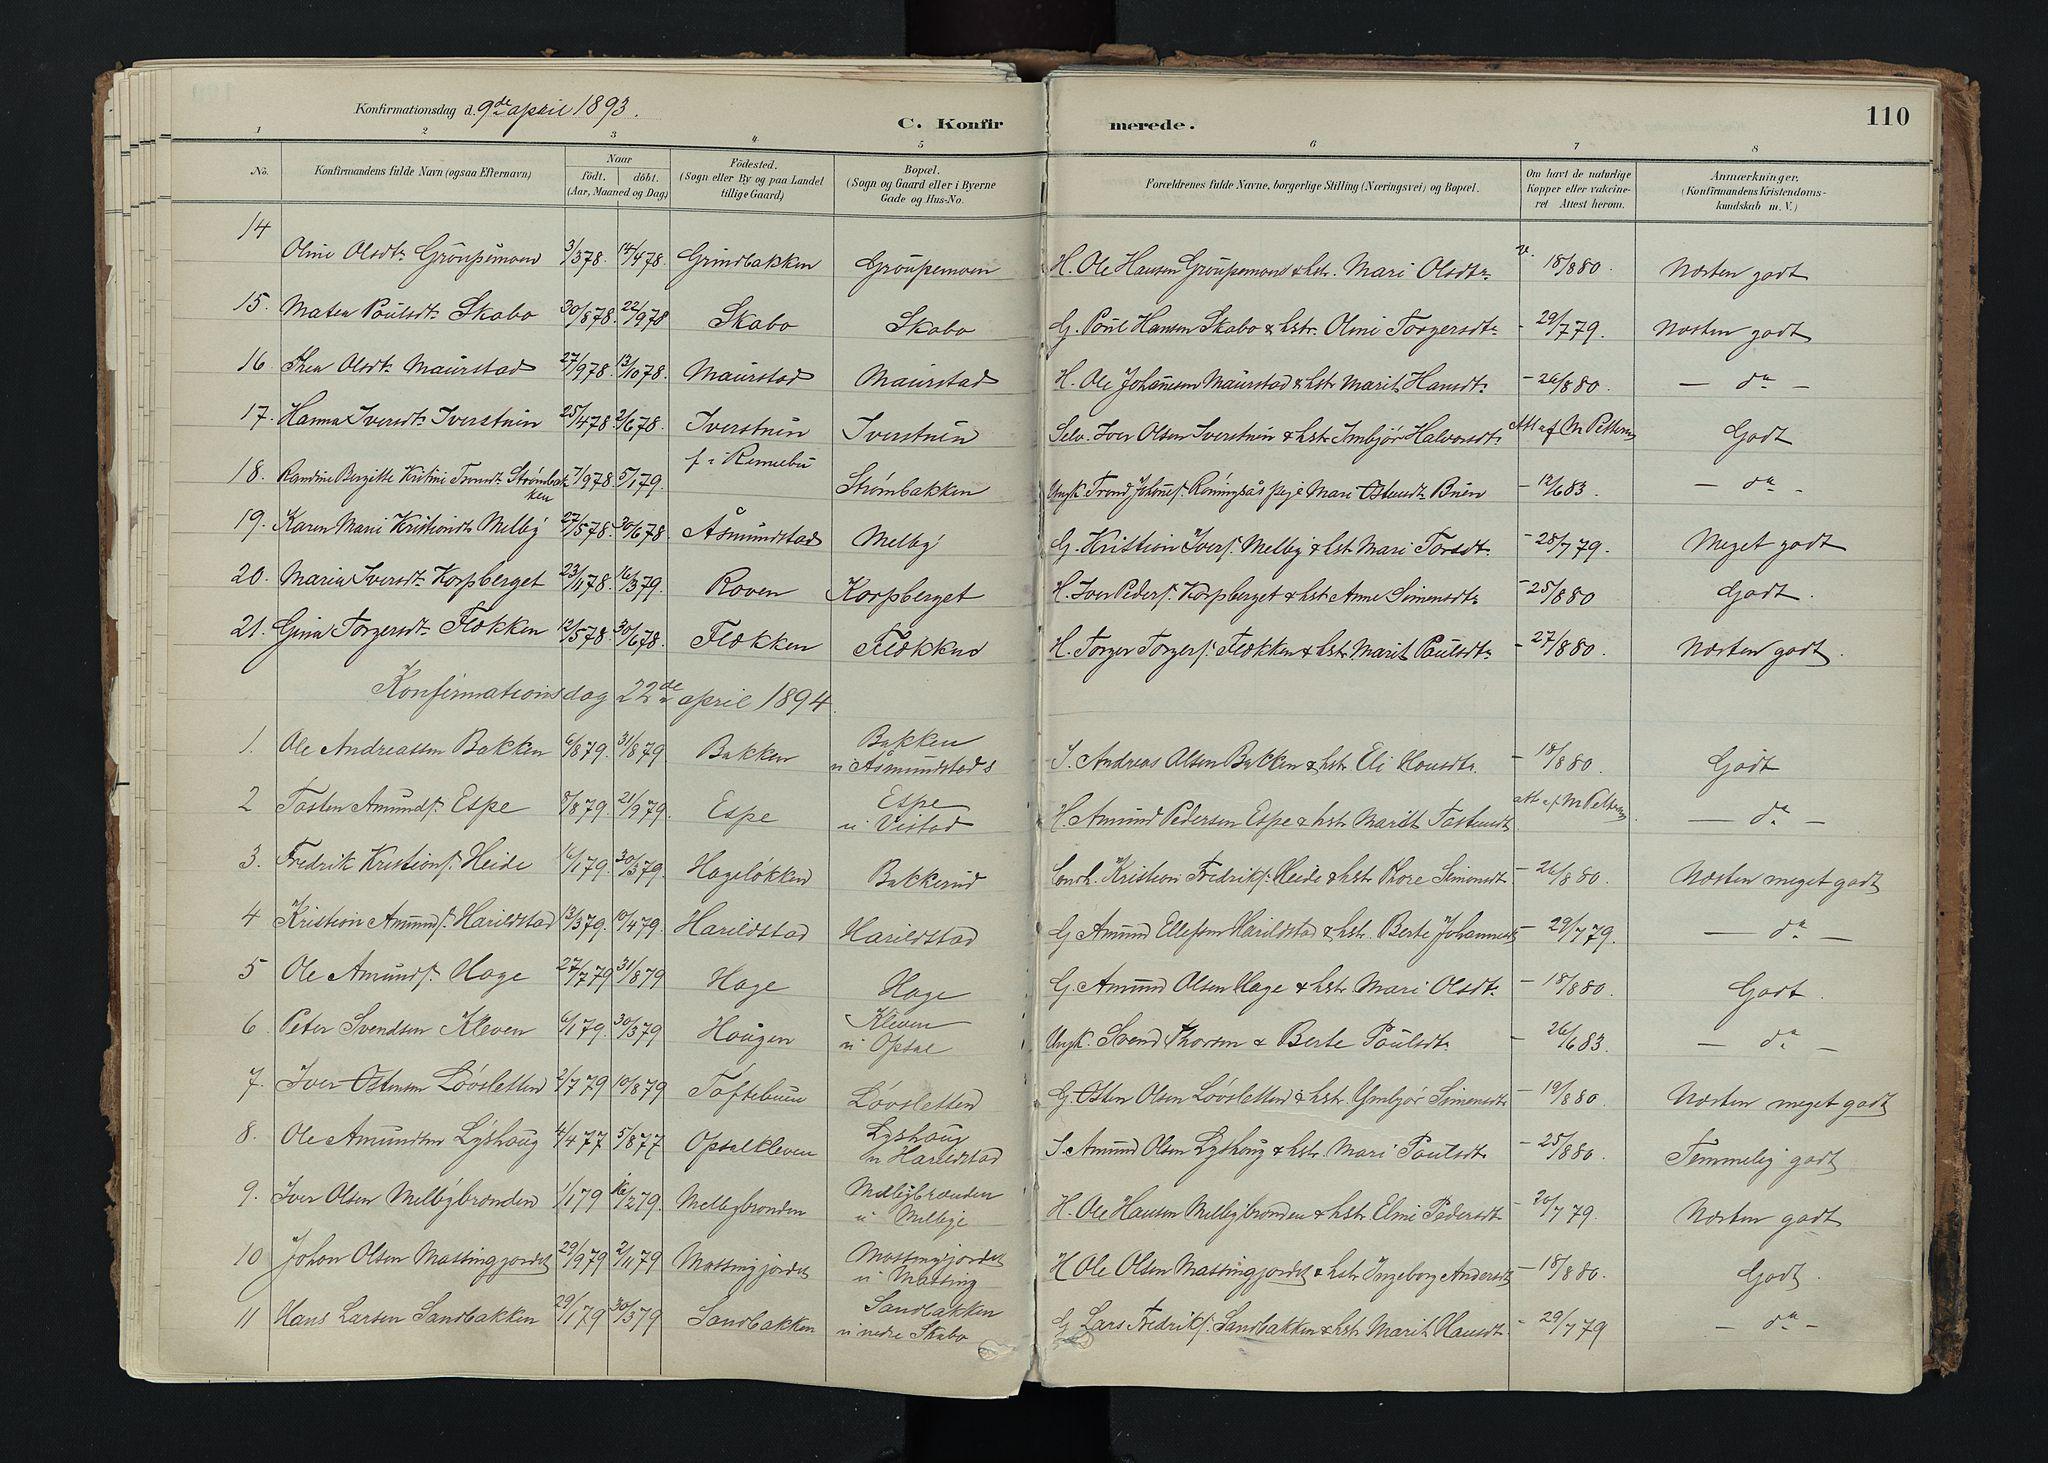 SAH, Nord-Fron prestekontor, Ministerialbok nr. 5, 1884-1914, s. 110